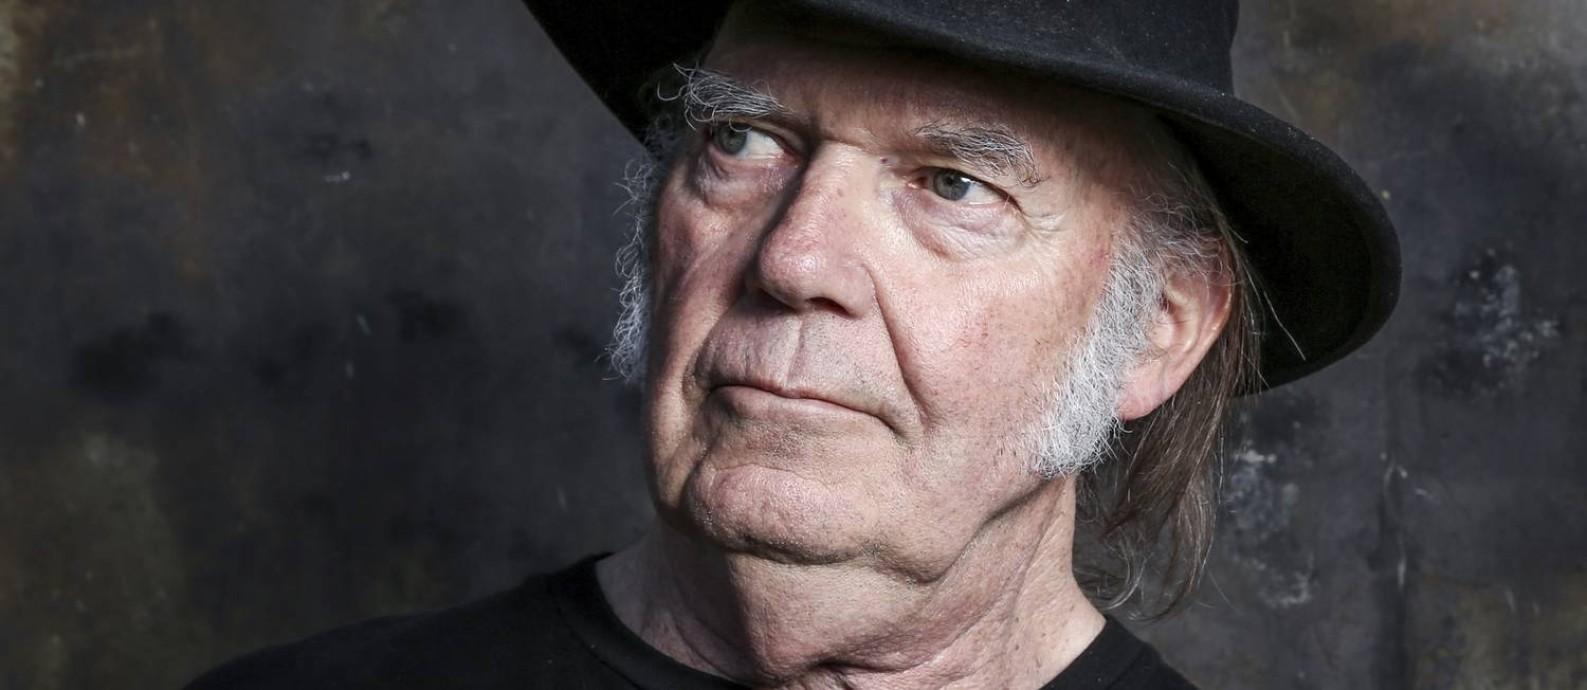 O cantor e compositor Neil Young disponibilizou seus discos na internet Foto: Rich Fury / AP